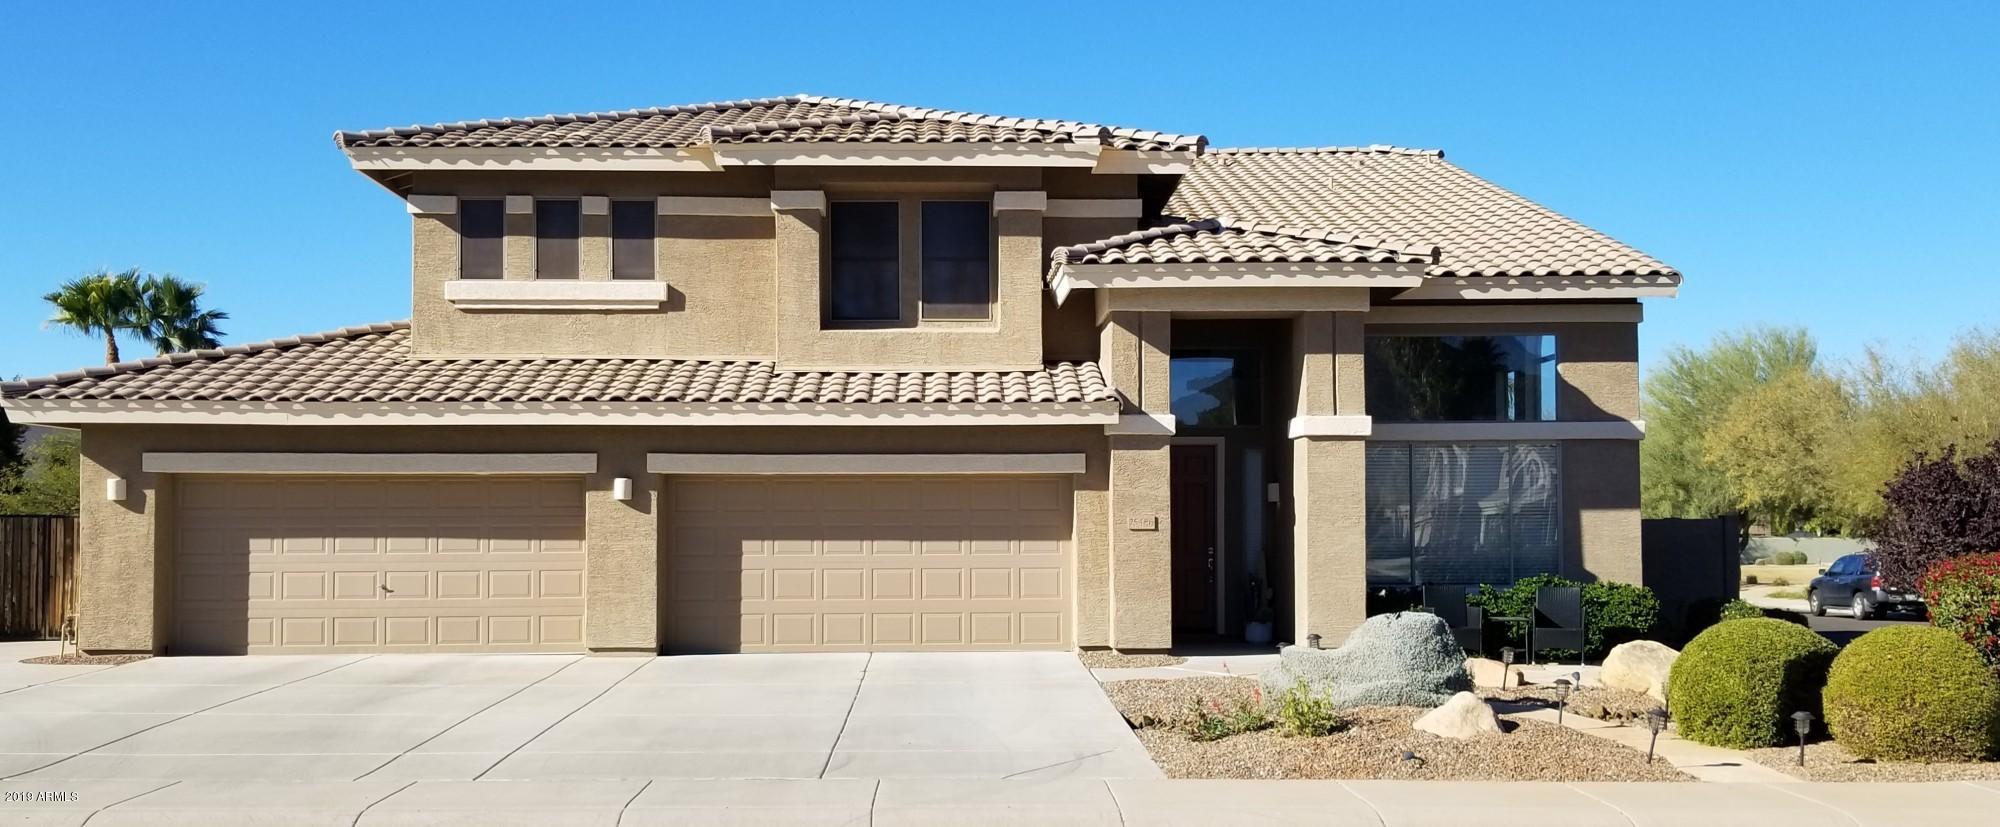 25486 N 69TH Avenue Peoria AZ 85383